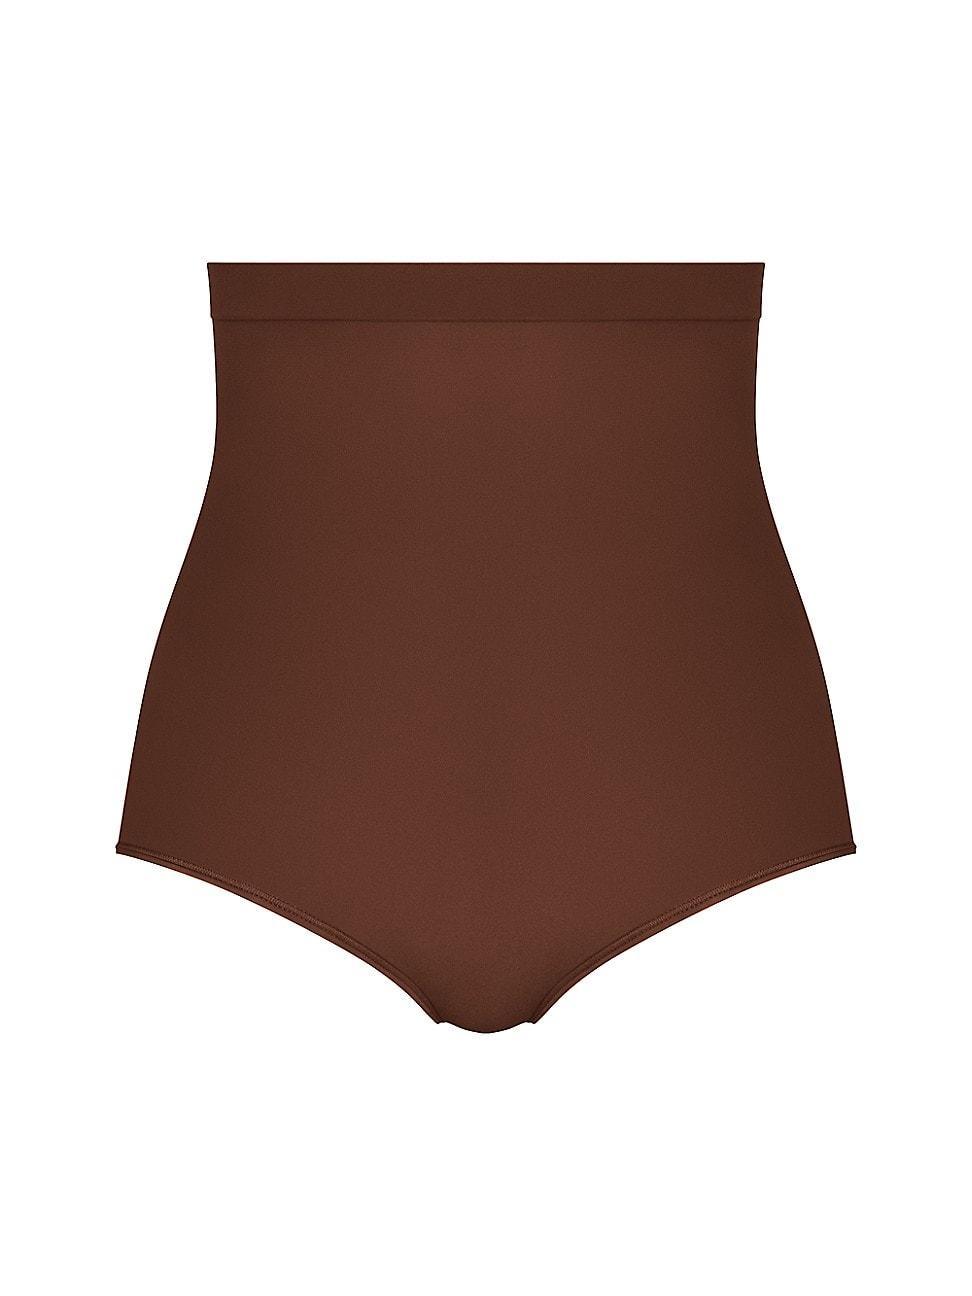 Spanx Panties WOMEN'S HIGHER POWER PANTY